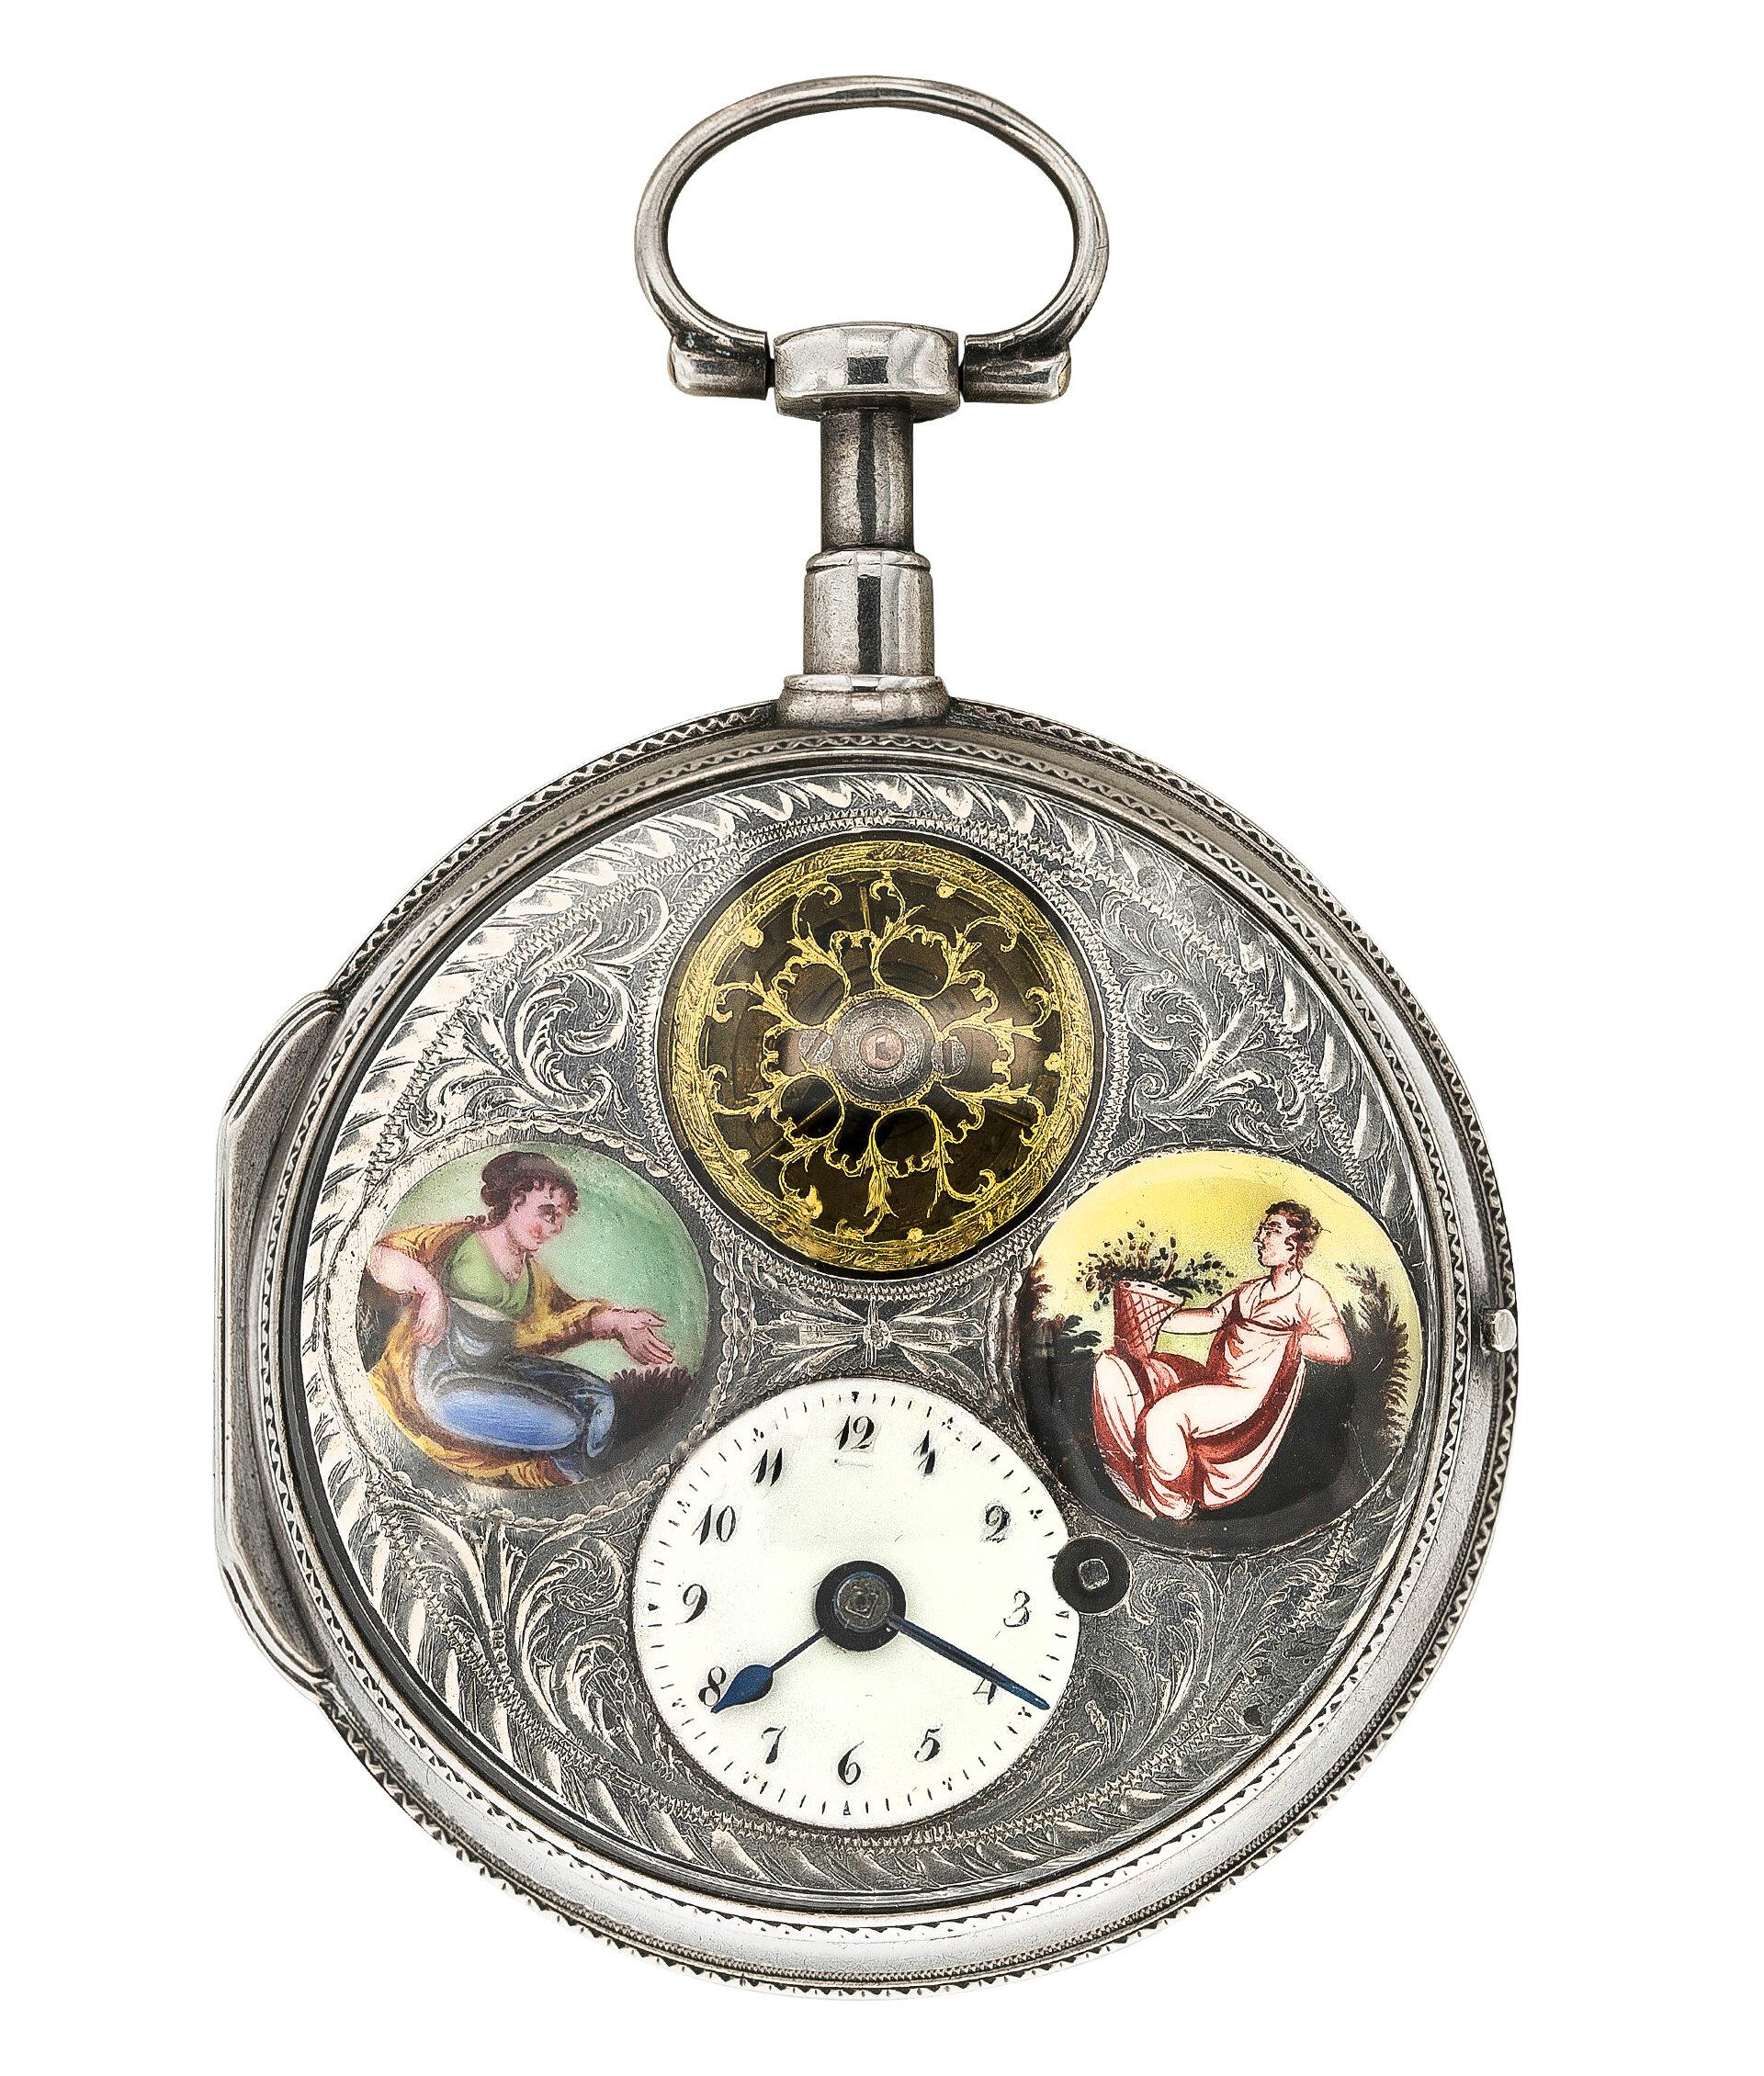 Карманные часы из серебра (начало 19 века)